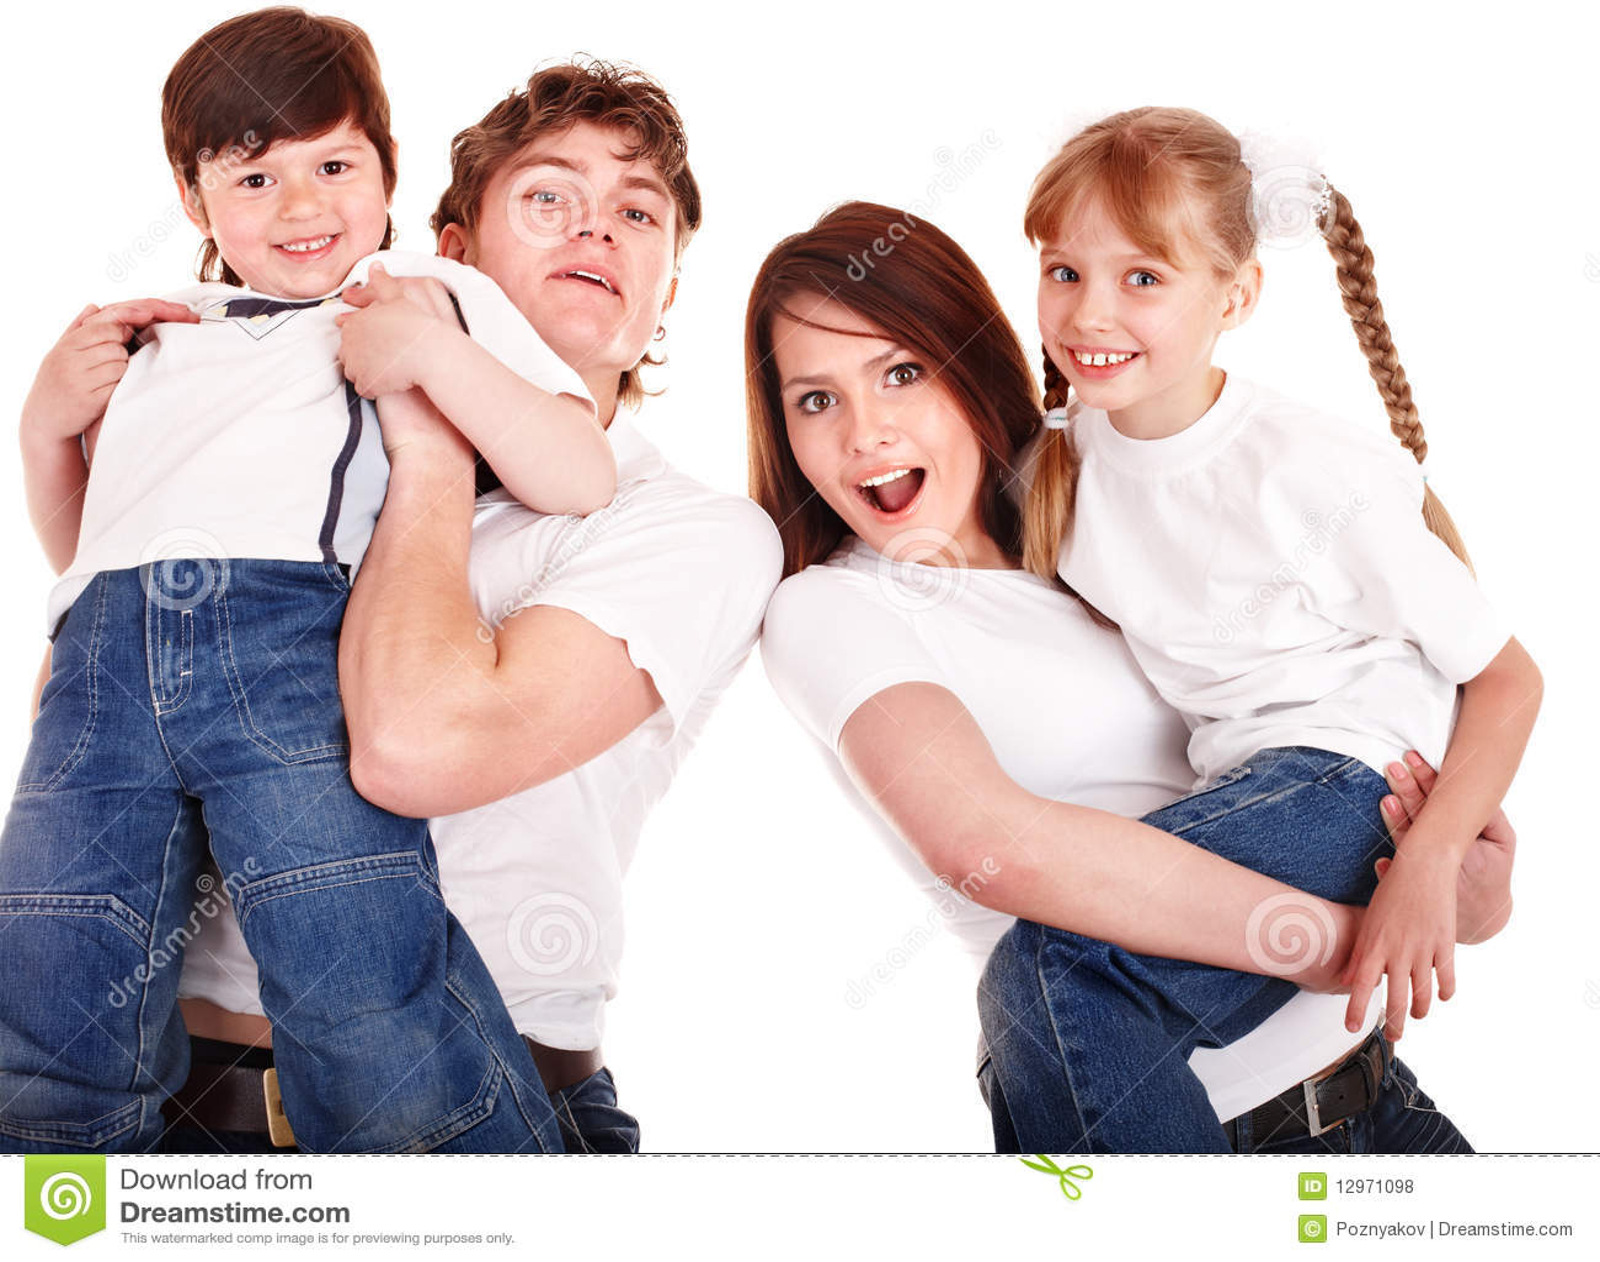 21 Tiendas para vestir madre e hija iguales Hello Papis